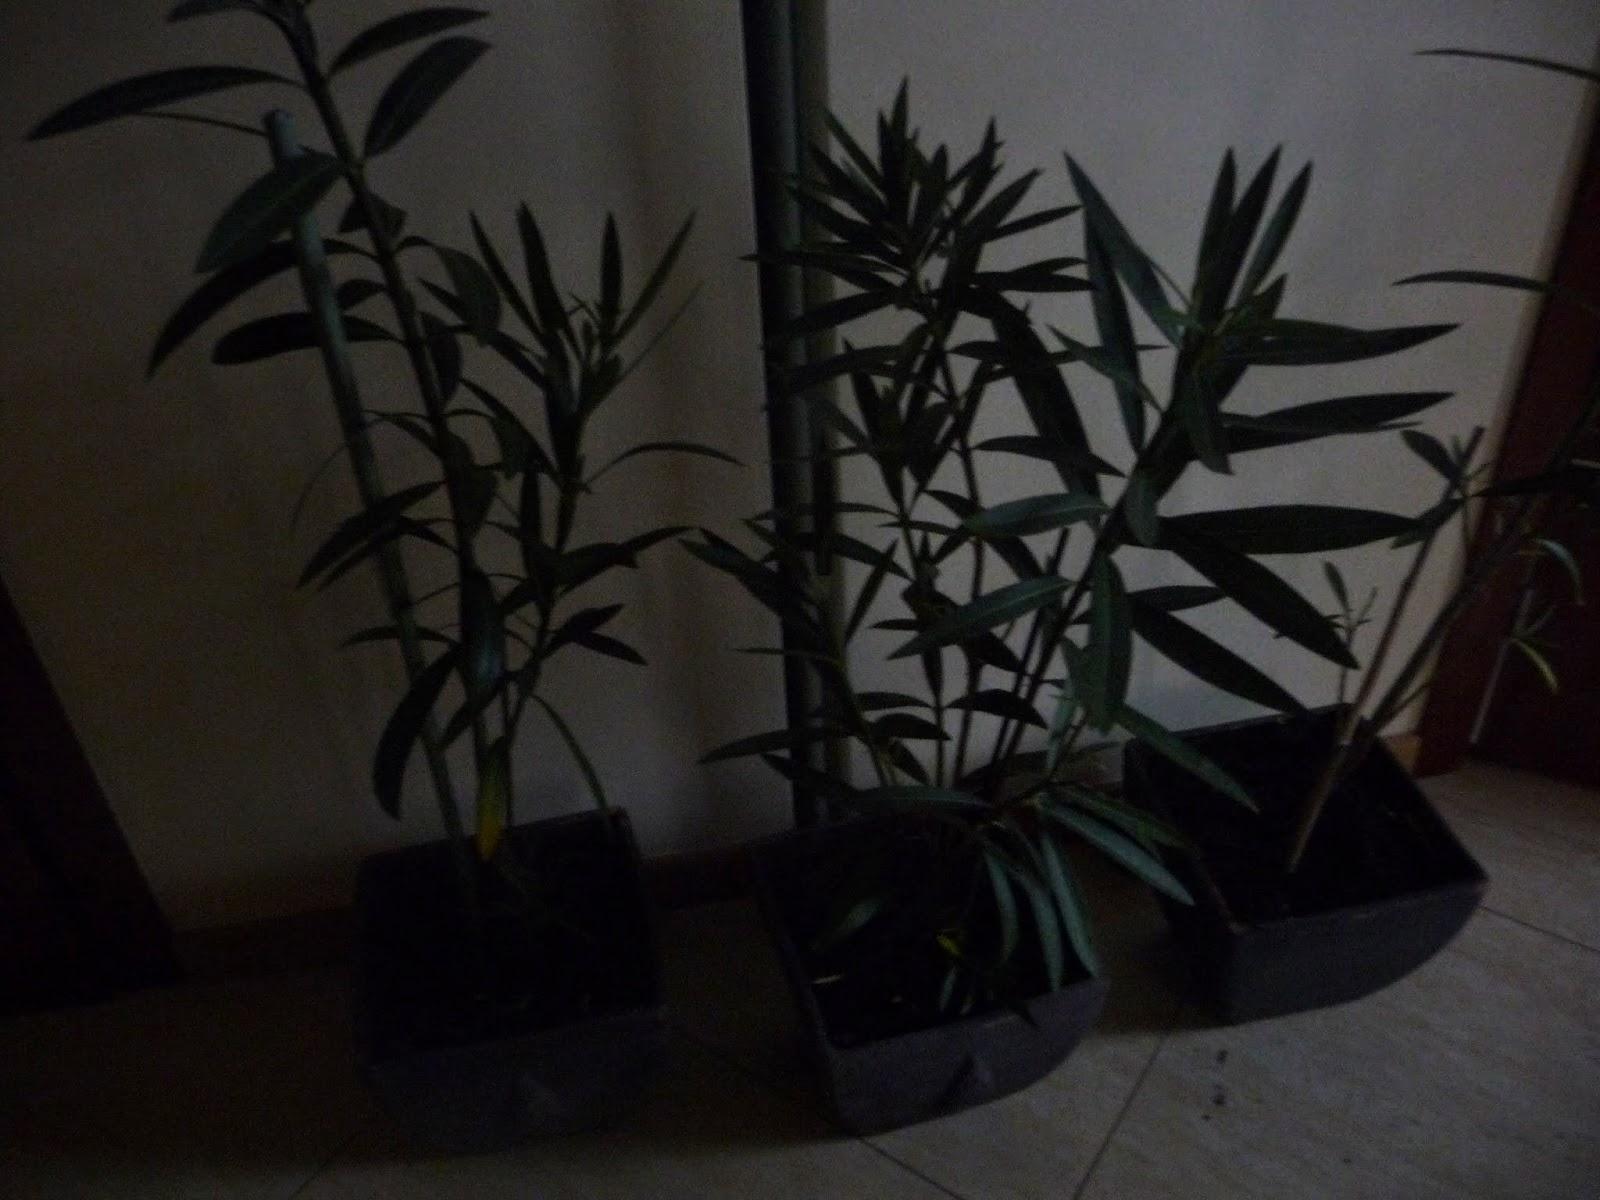 jak rozsadzić oleander